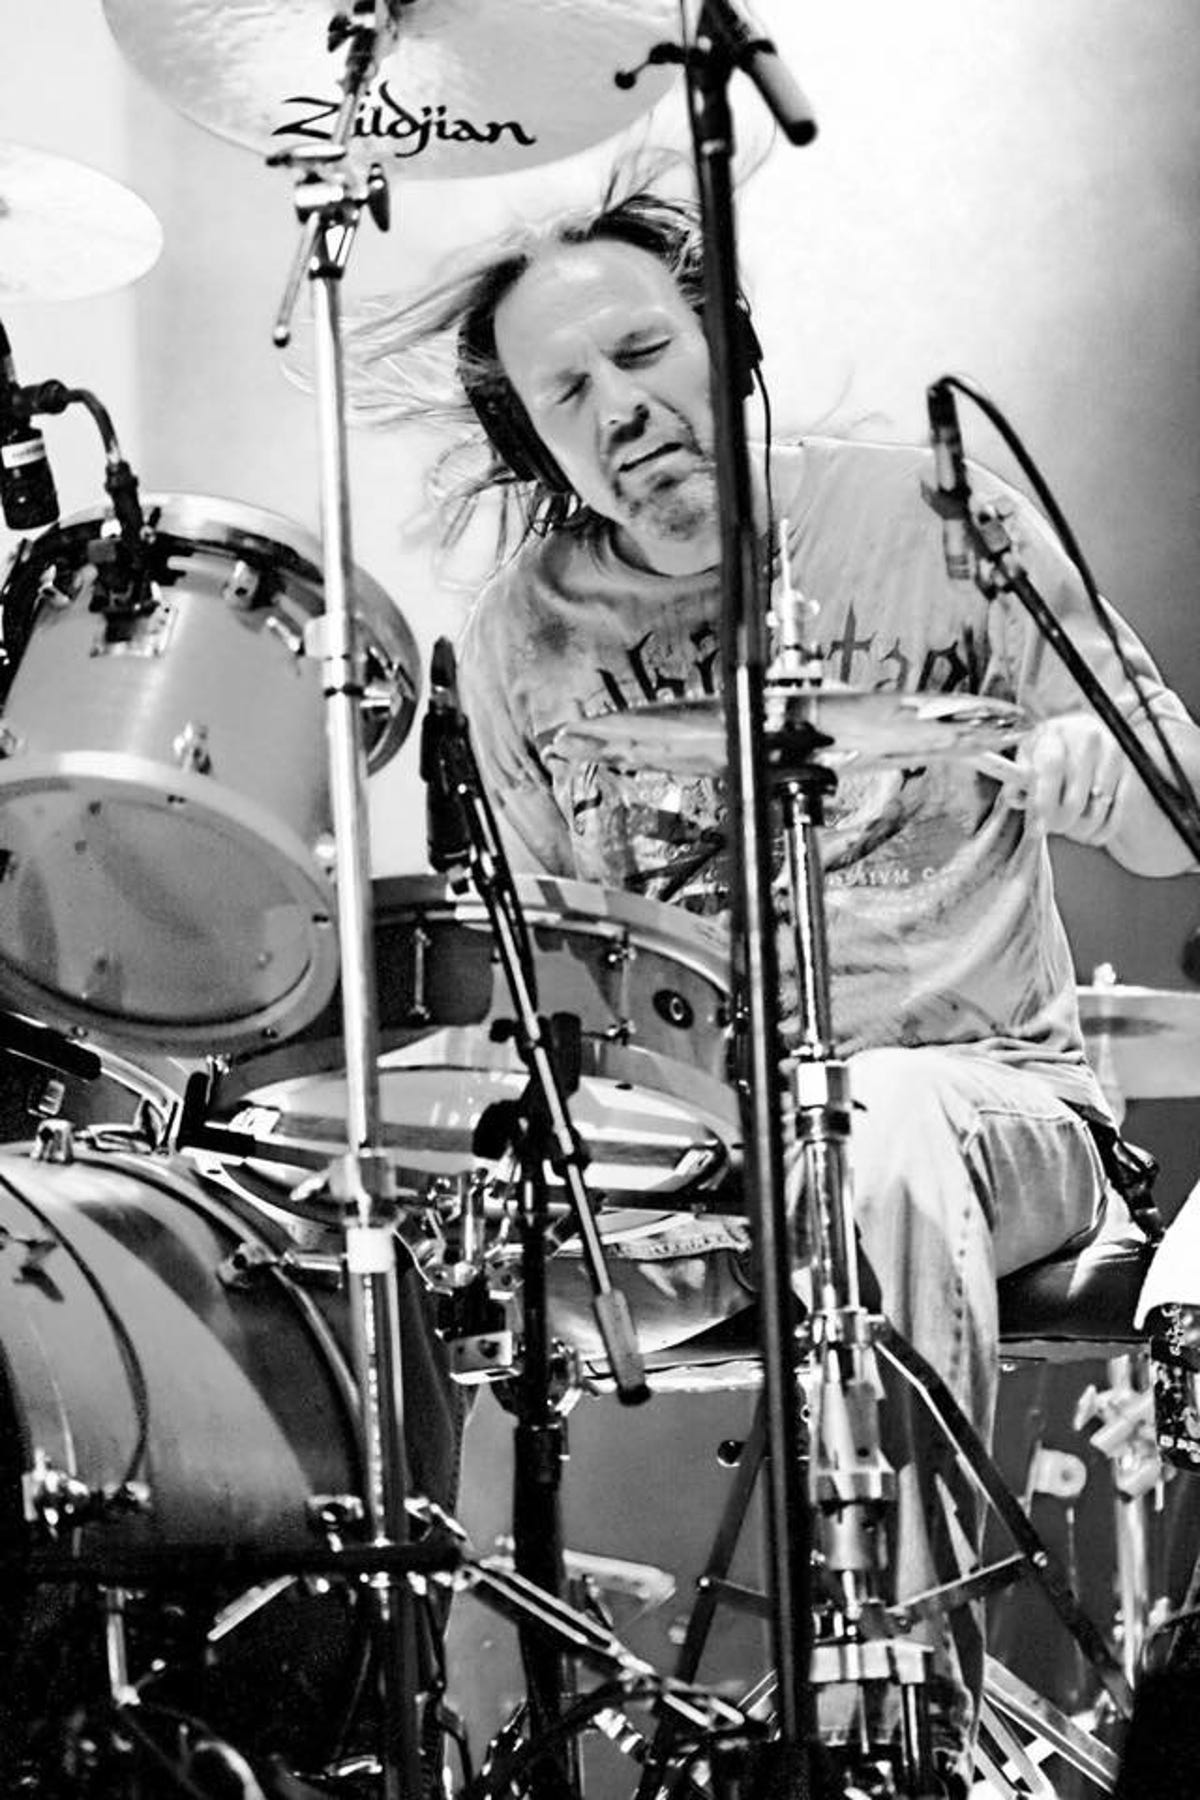 George Strait's drummer, Mike Kennedy, killed in a car crash